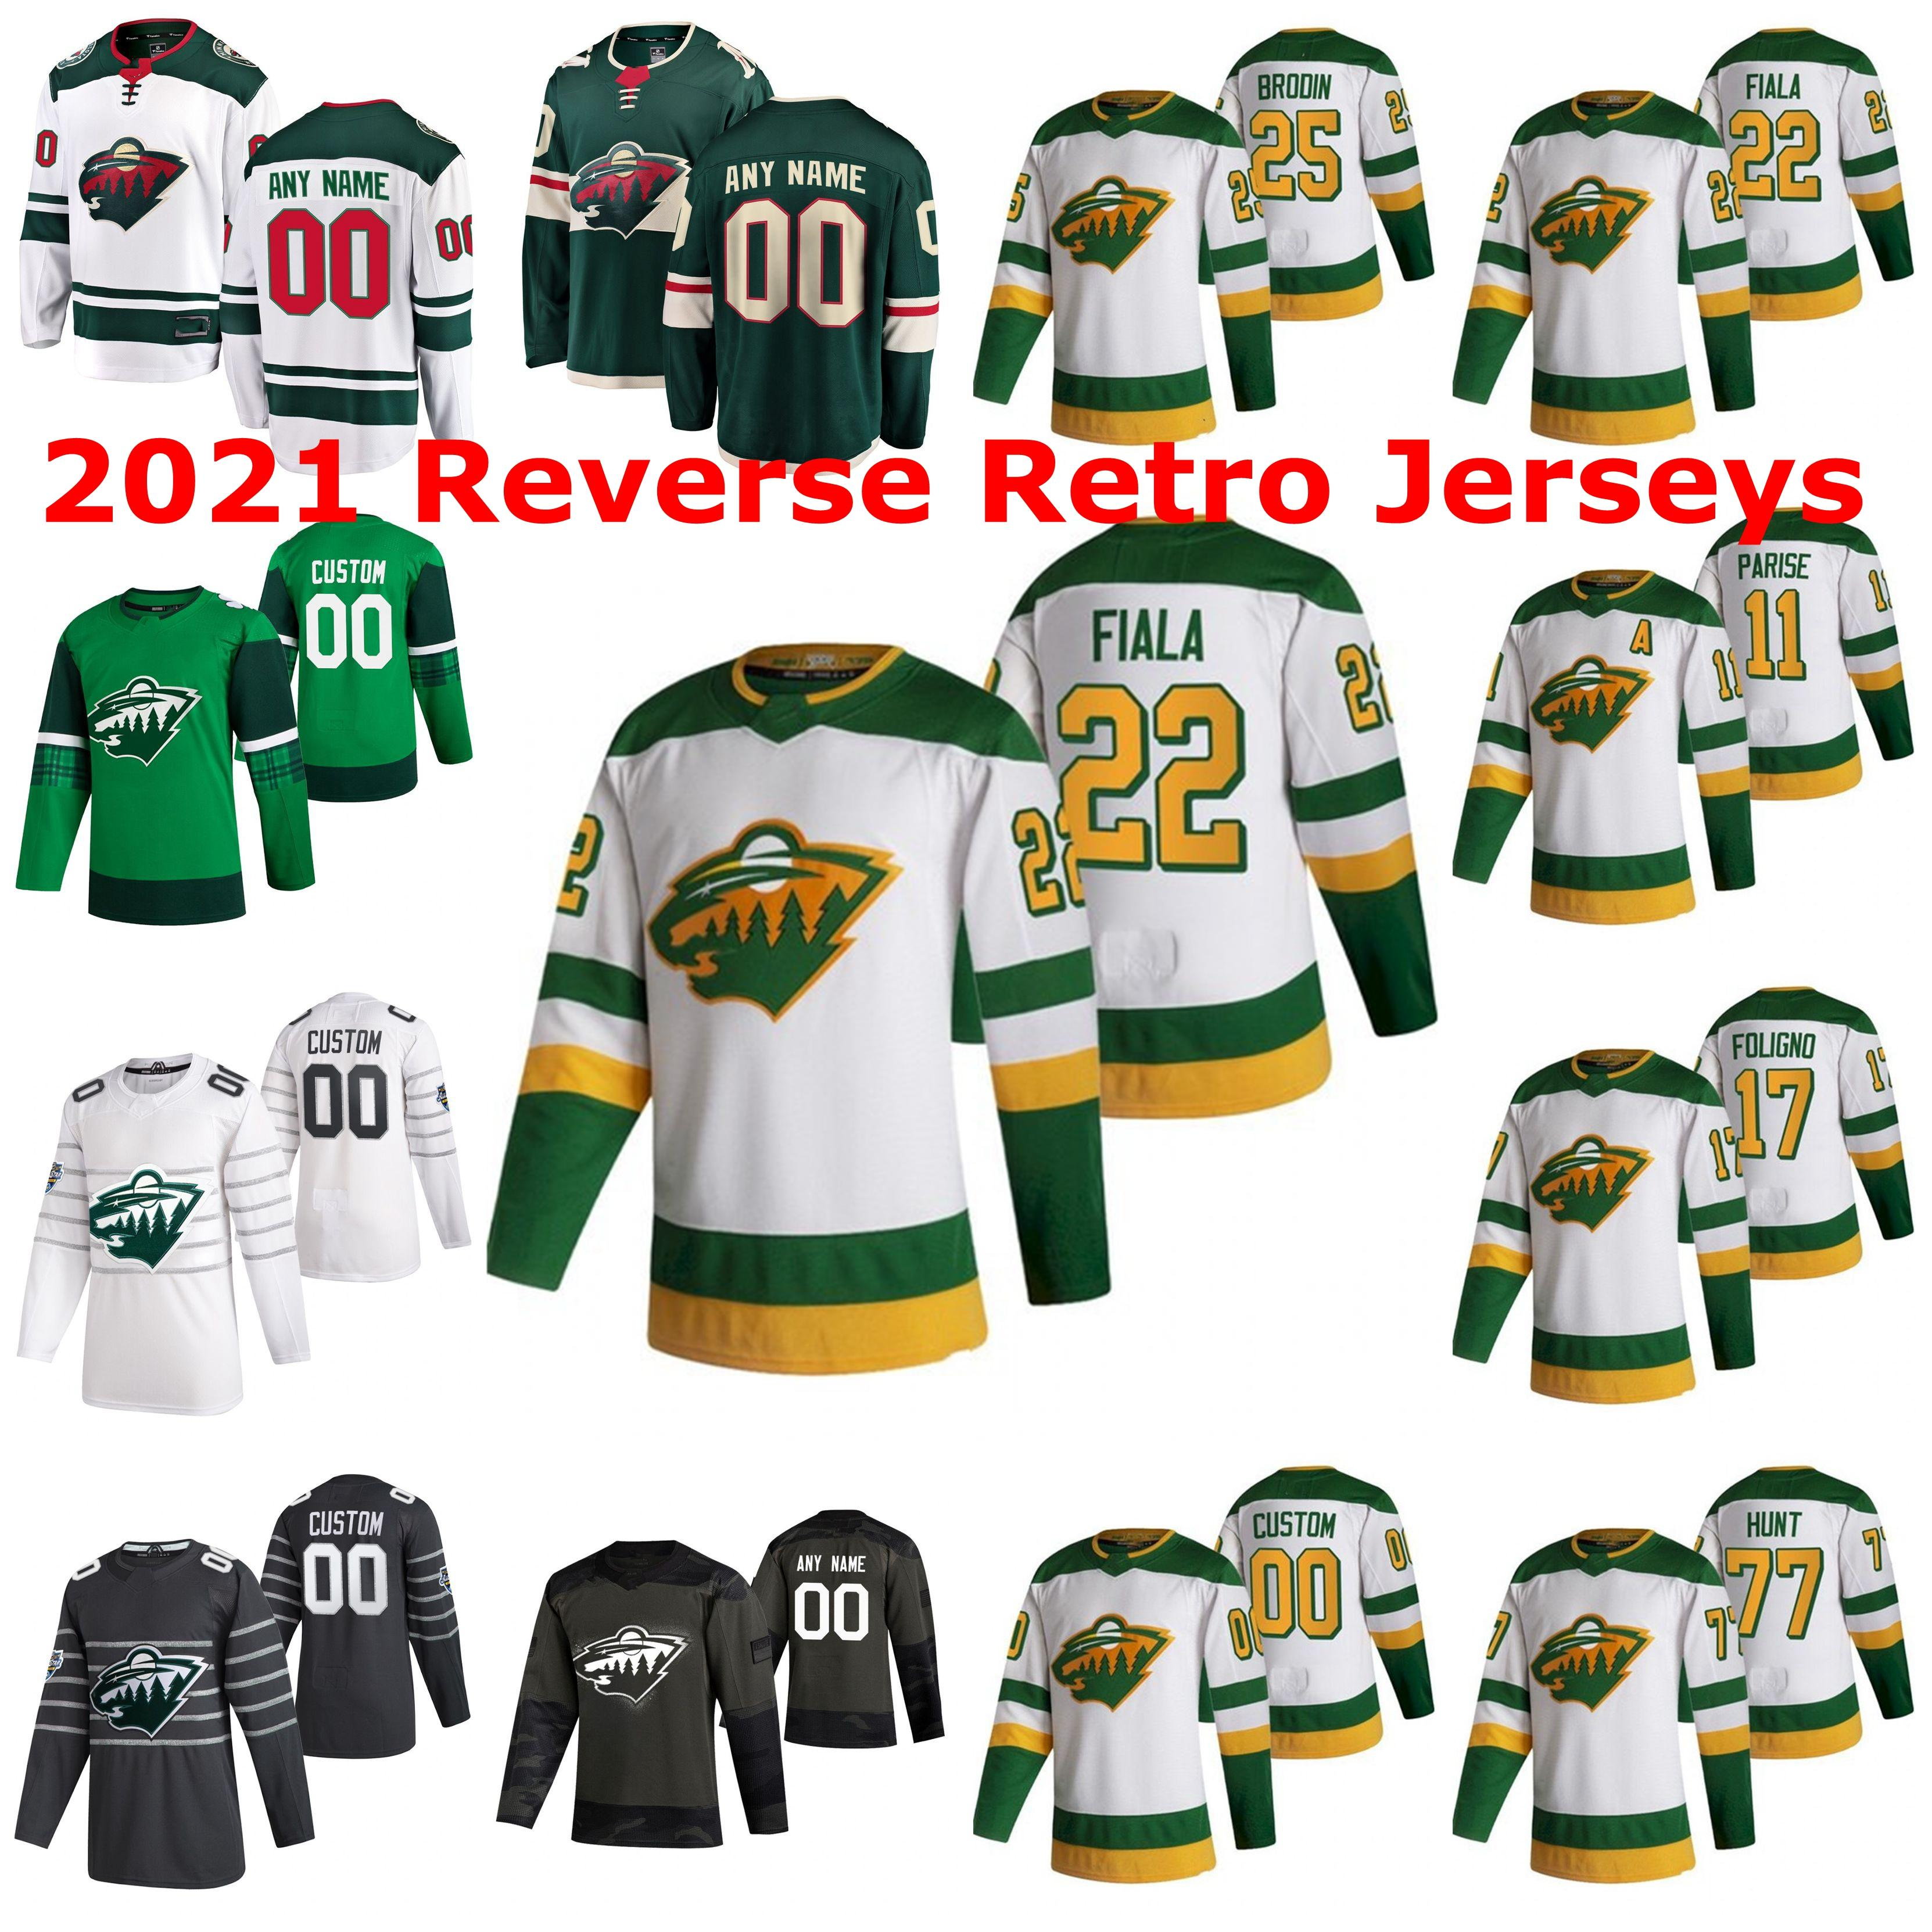 Minnesota Wild 2021 Reverse Retro Jerseys Gabriel Dumont Jersey Joel Eriksson Ek Kevin Fiala Marcus Foligno Nino Niederreiter Custom Stitch